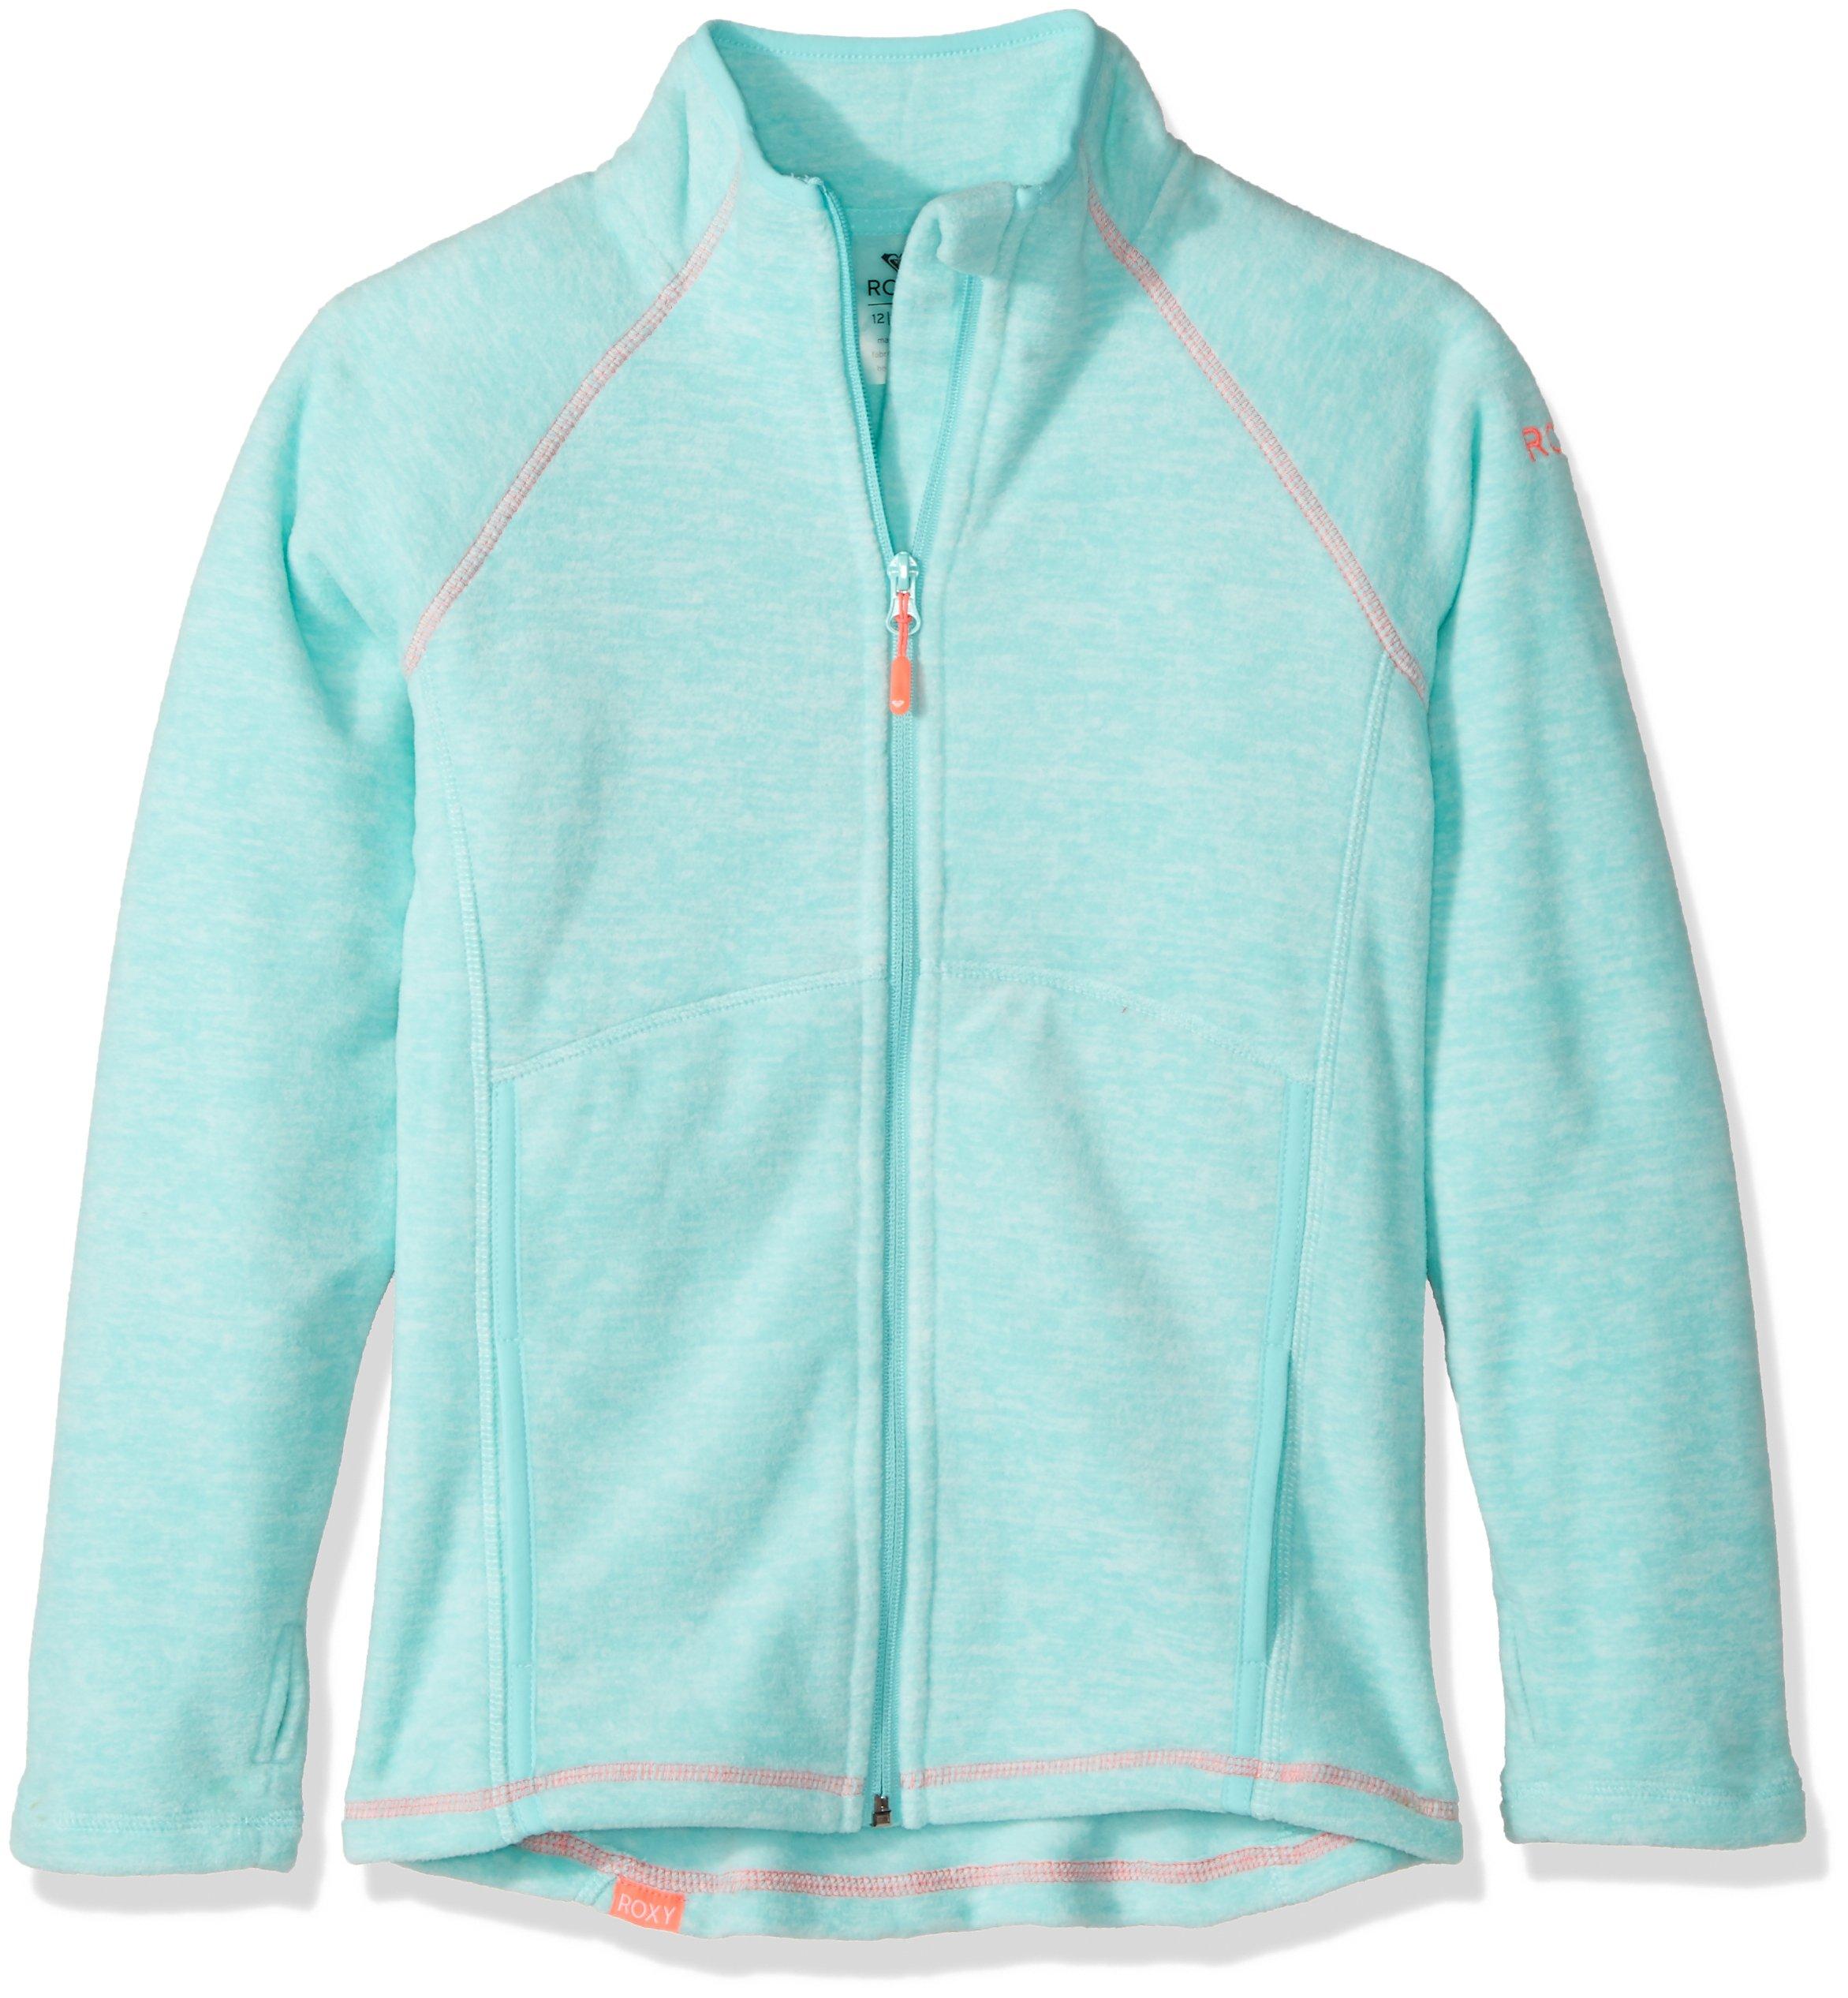 Roxy Big Girls' Harmony Polar Fleece Zip up Jacket, Aruba Blue, 10/M